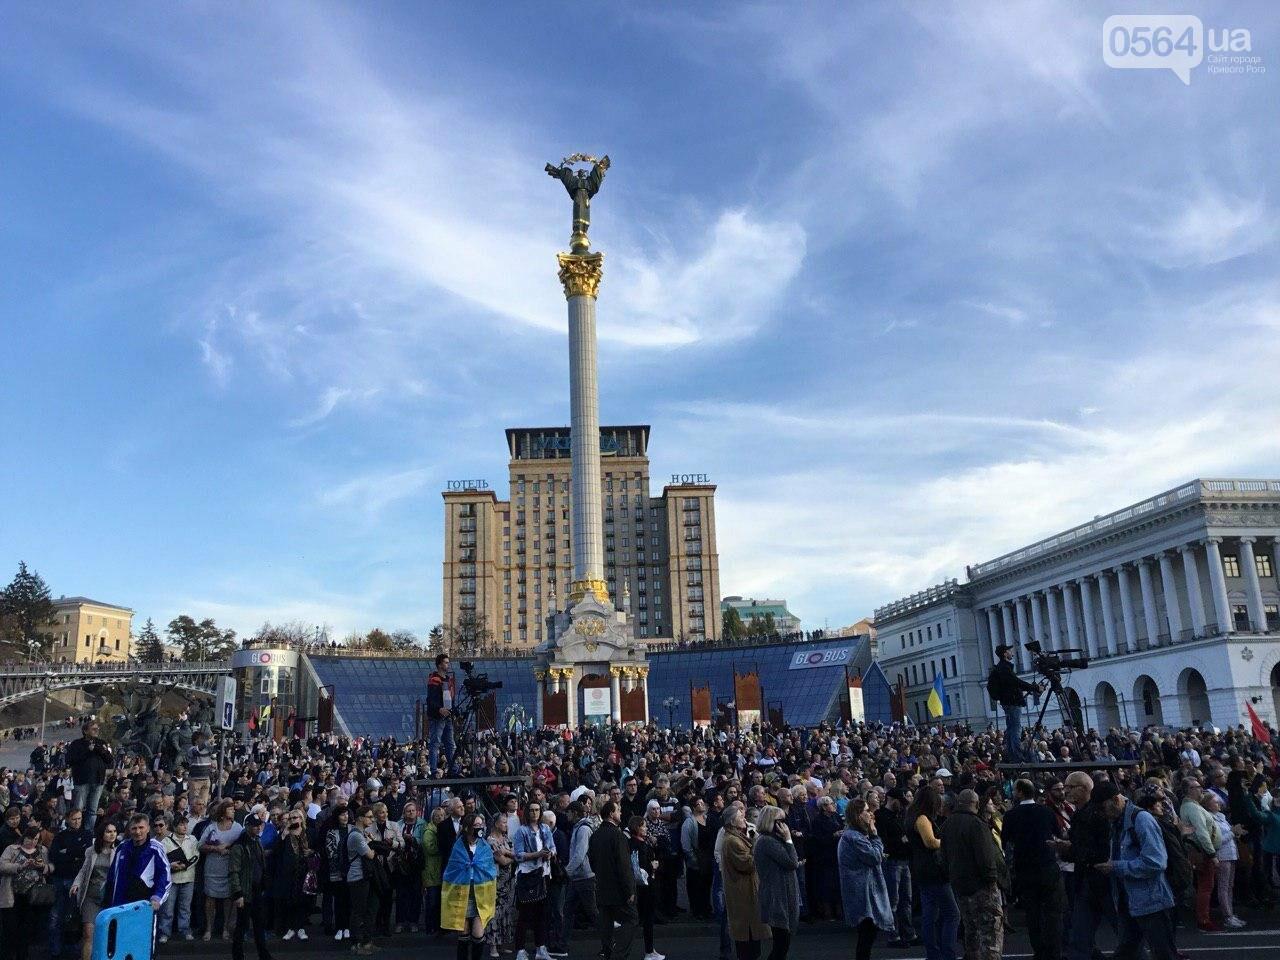 Криворожане поддержали Марш сопротивления капитуляции в Киеве, - ФОТО, ВИДЕО, ОБНОВЛЕНО, фото-25